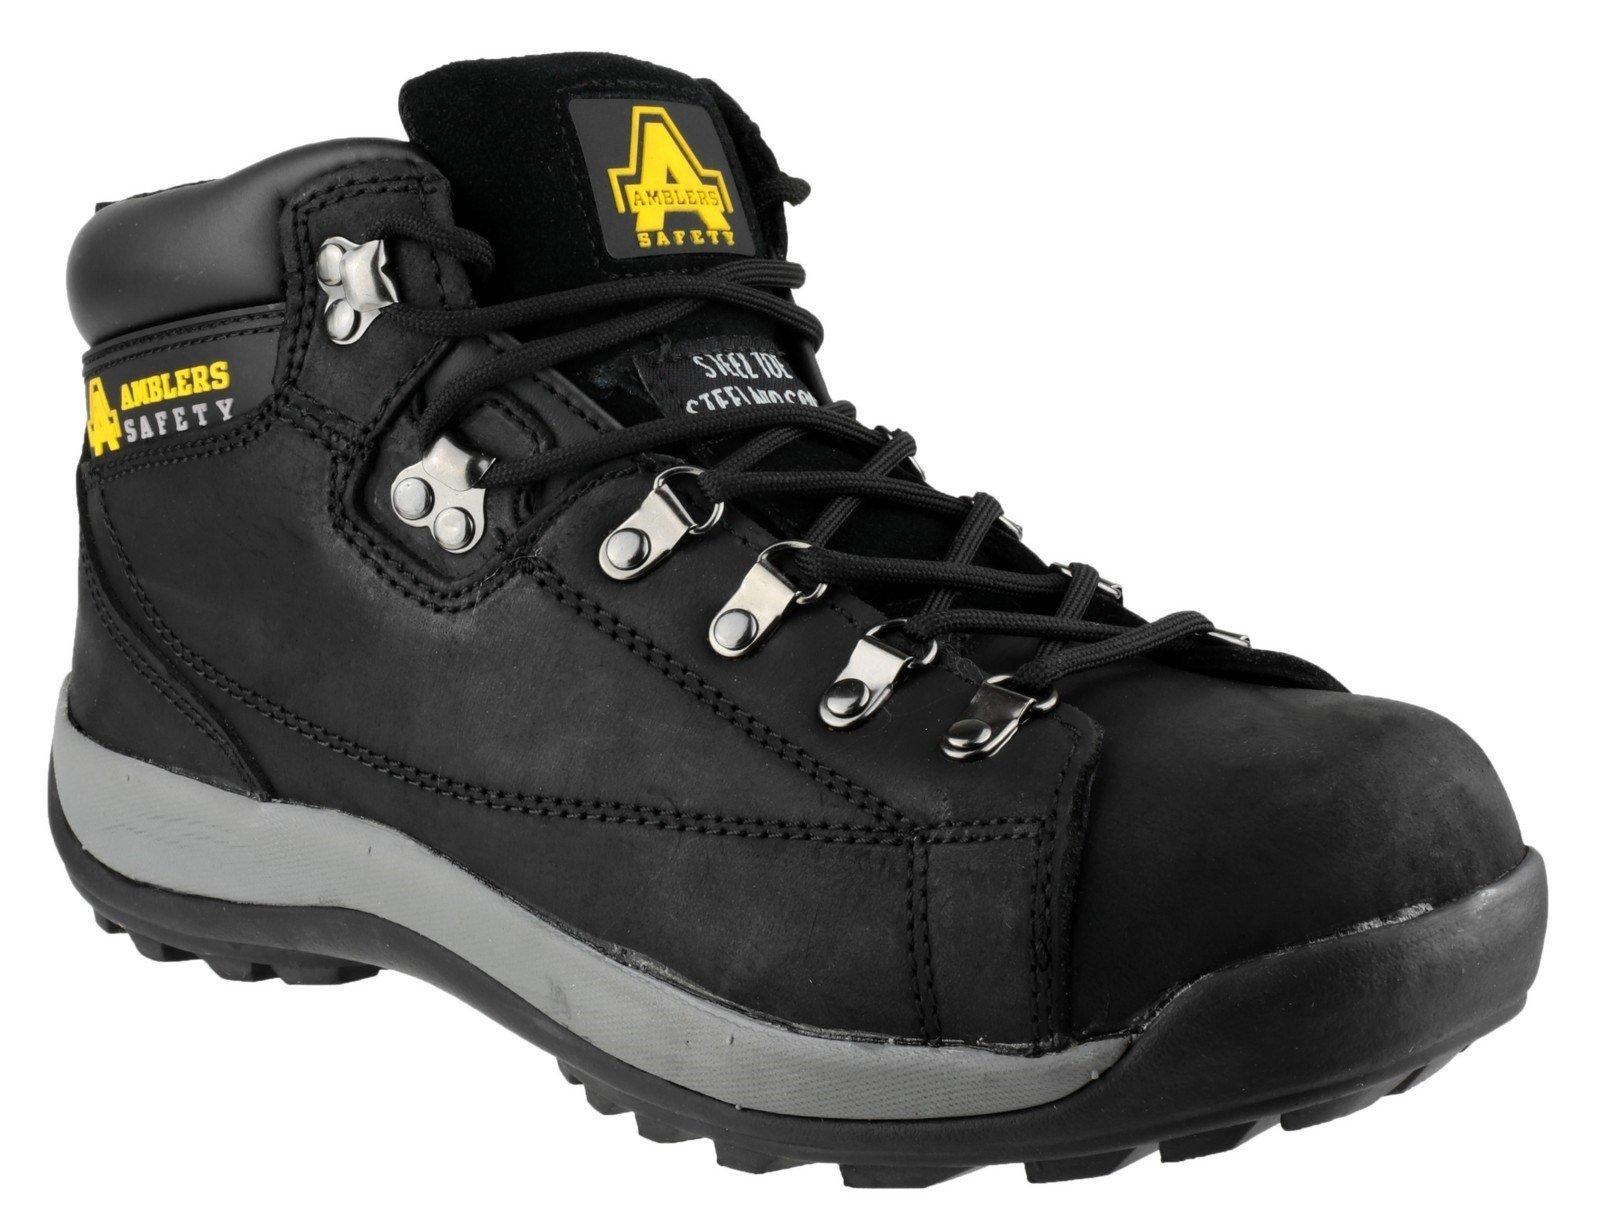 Amblers Unisex Safety Hardwearing Lace up Boot Black 13719 - Black 11